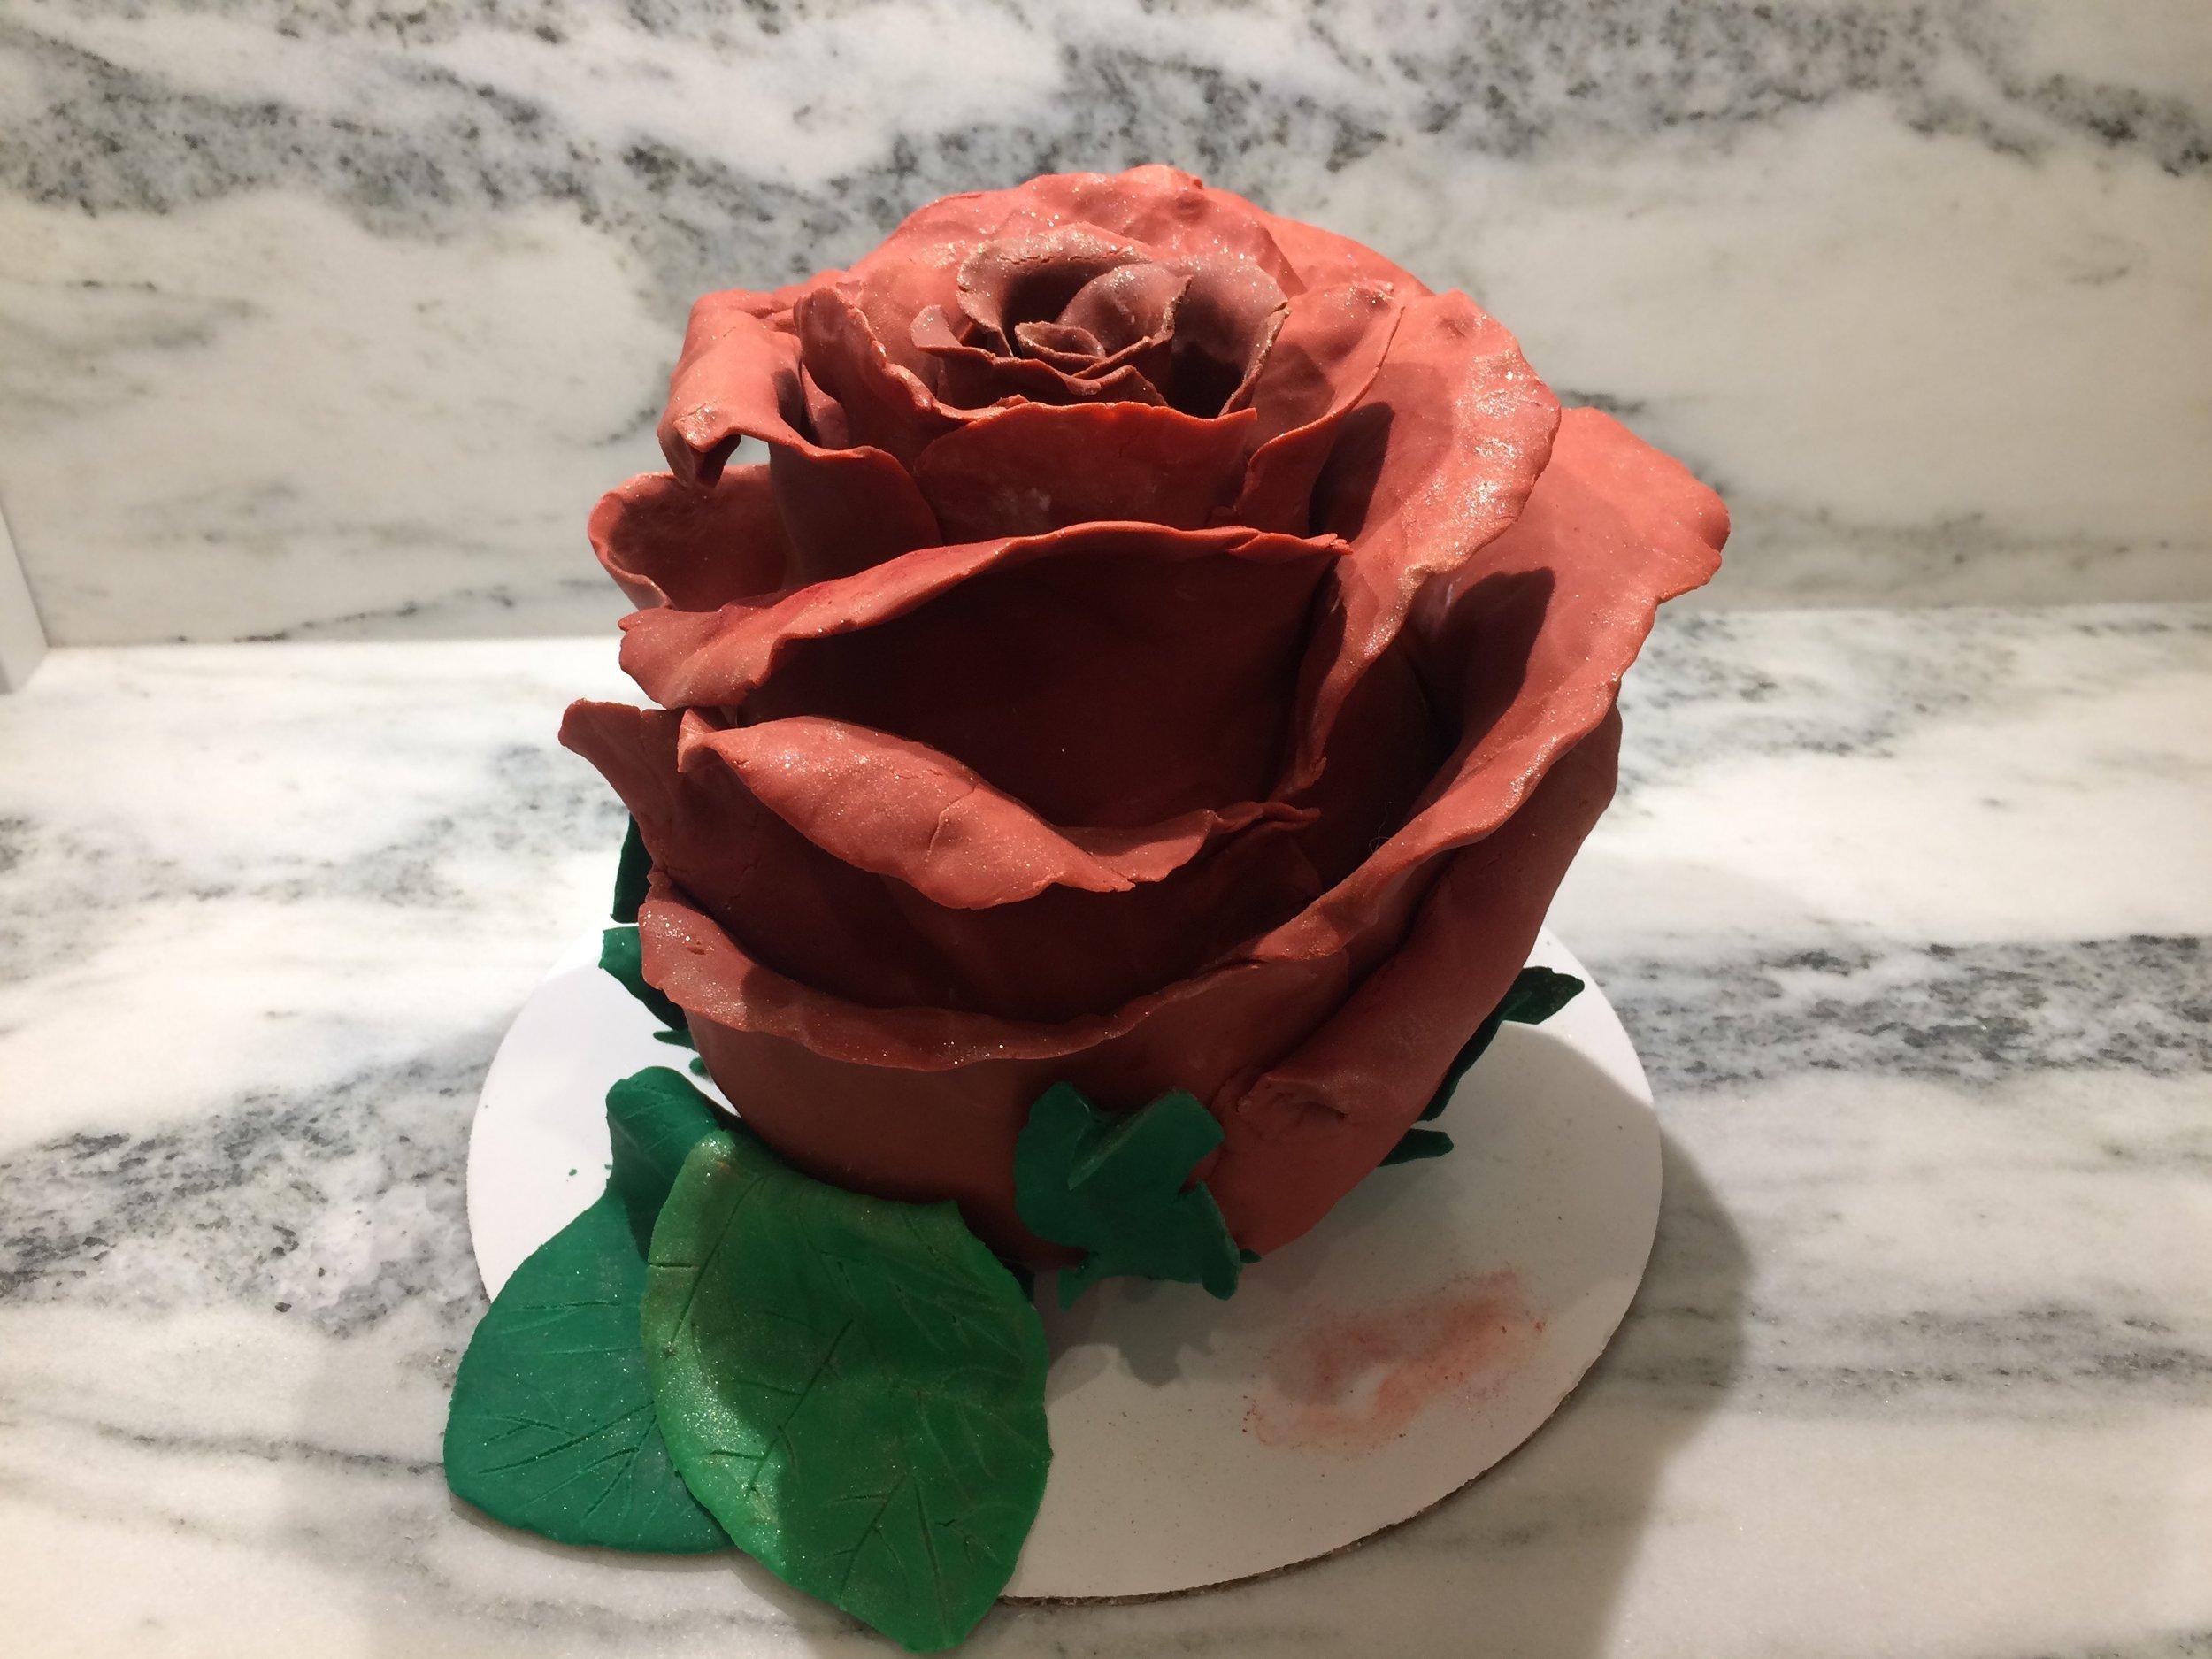 Rose Cake - Funfetti cake, Strawberry Swiss Meringue buttercream, and modeling chocolate